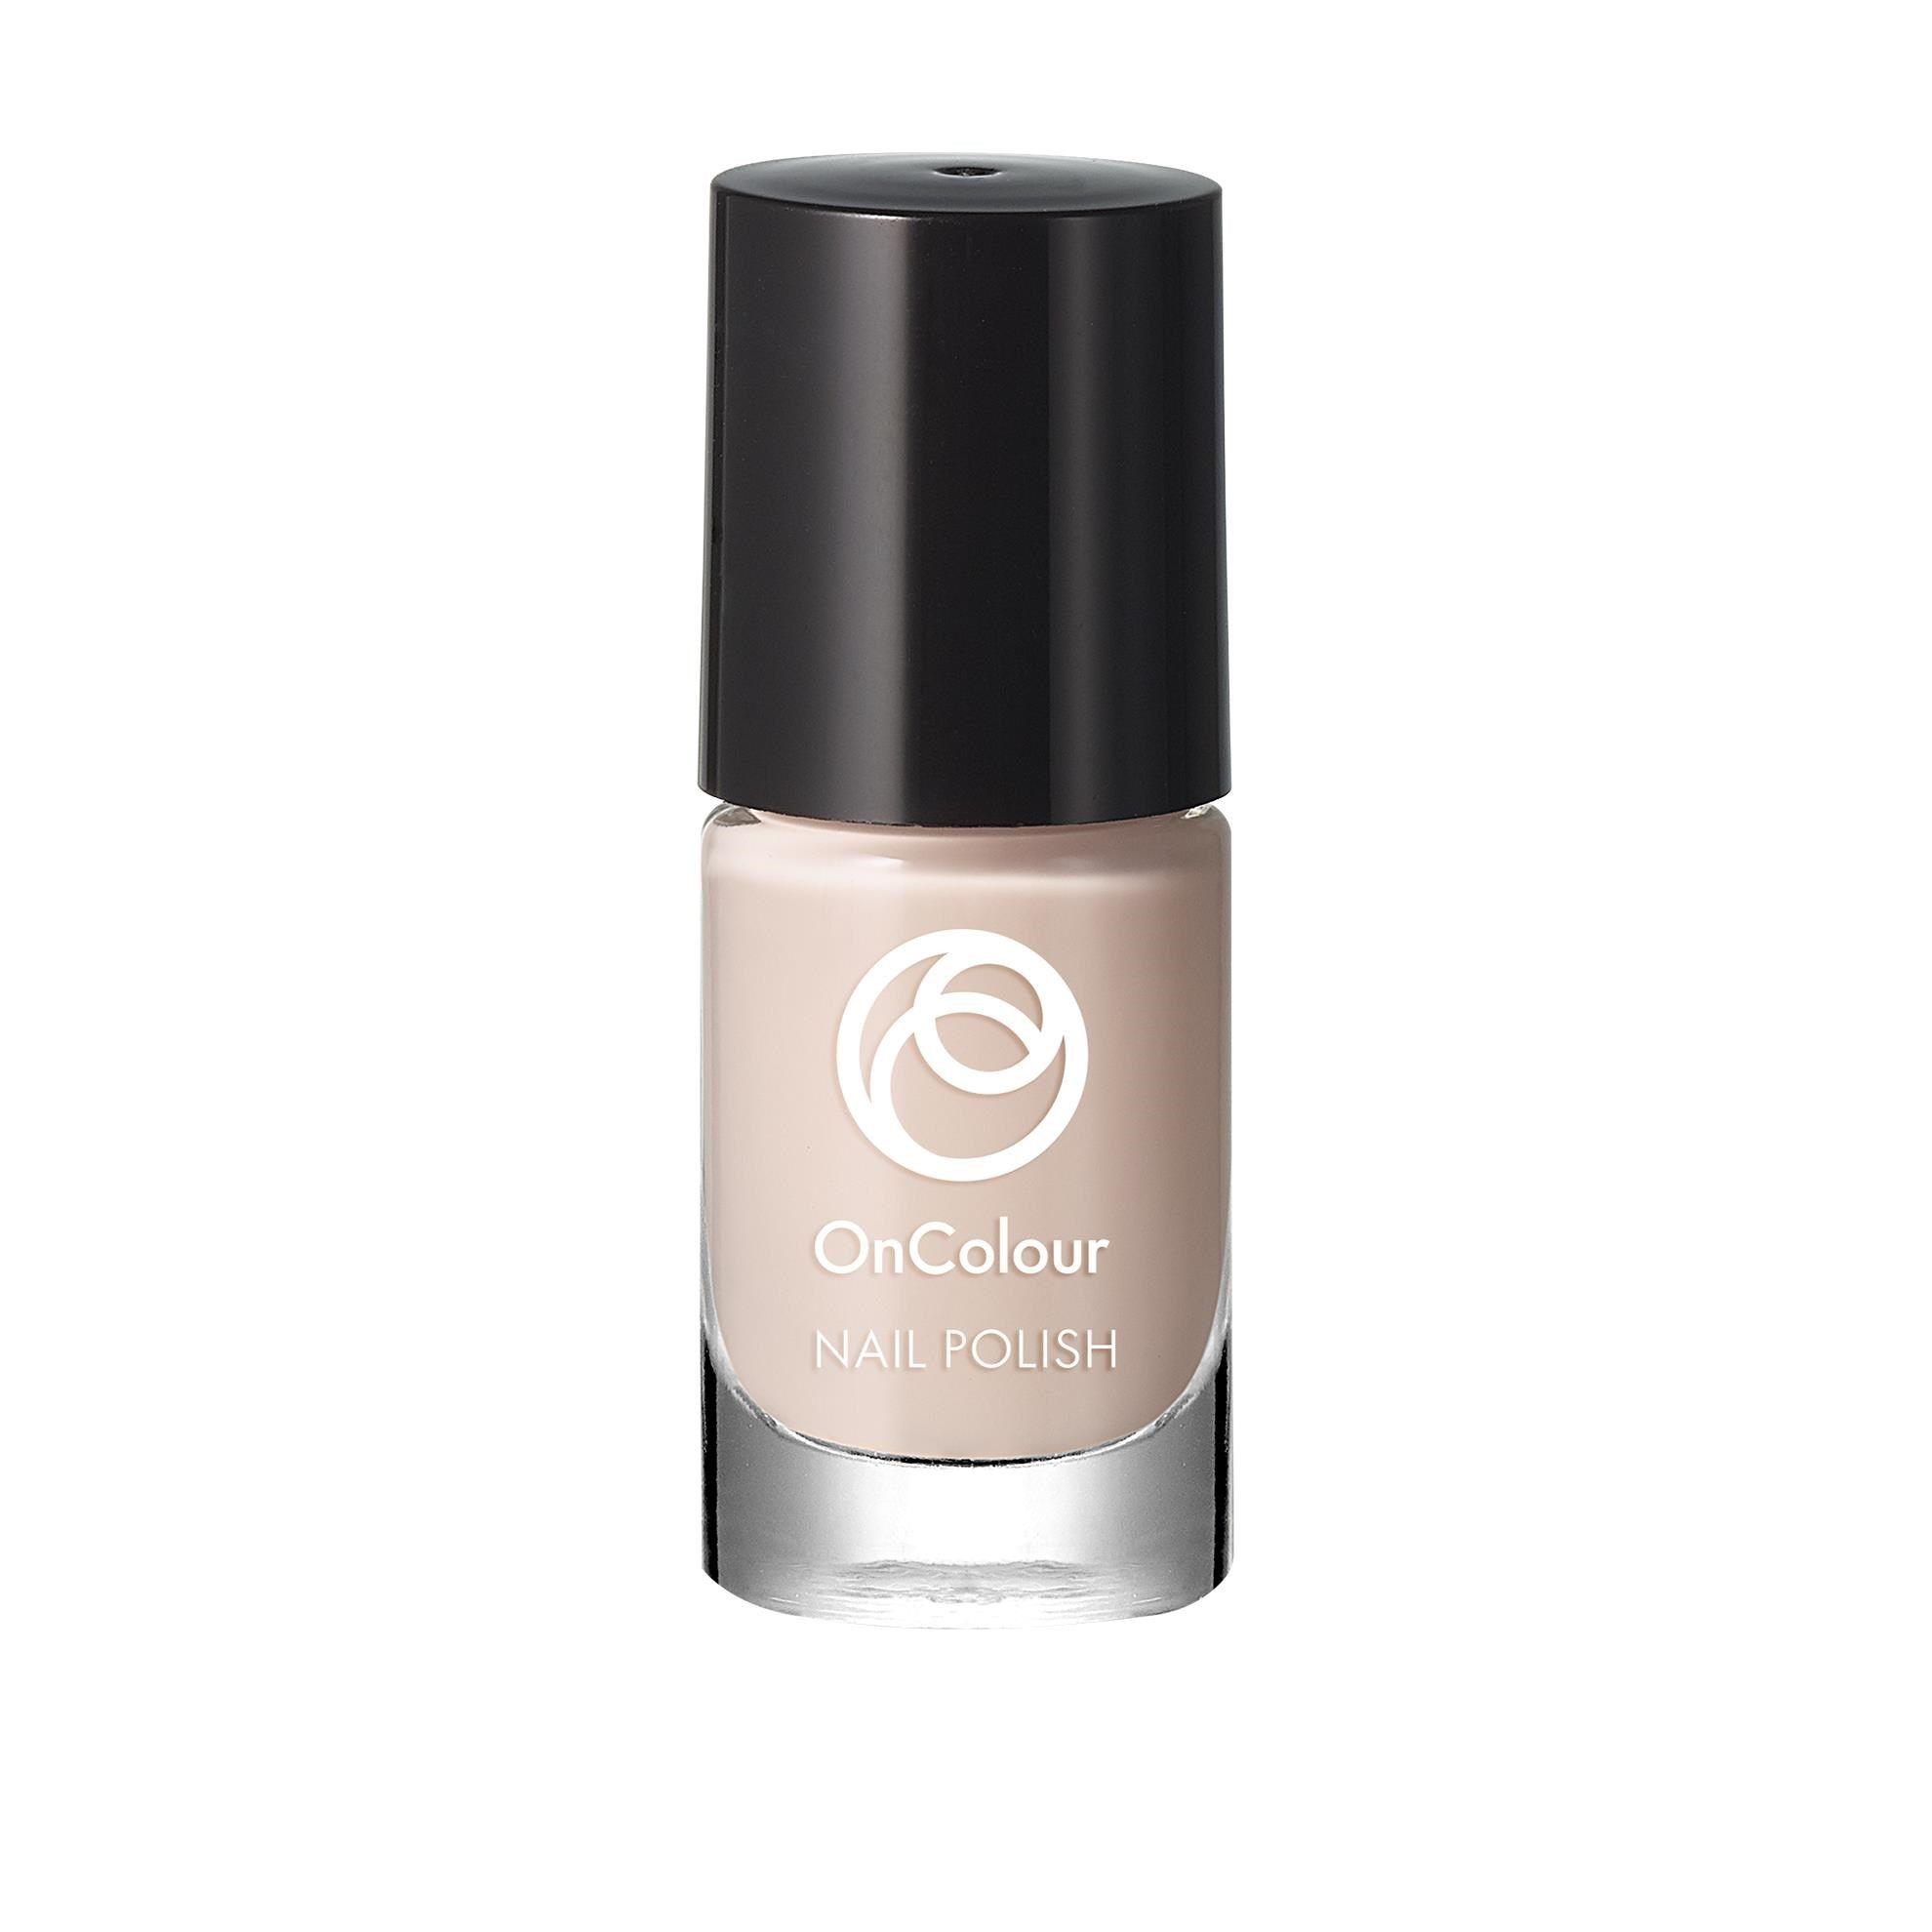 OnColour Nail Polish in 2020 Nail polish, Oriflame